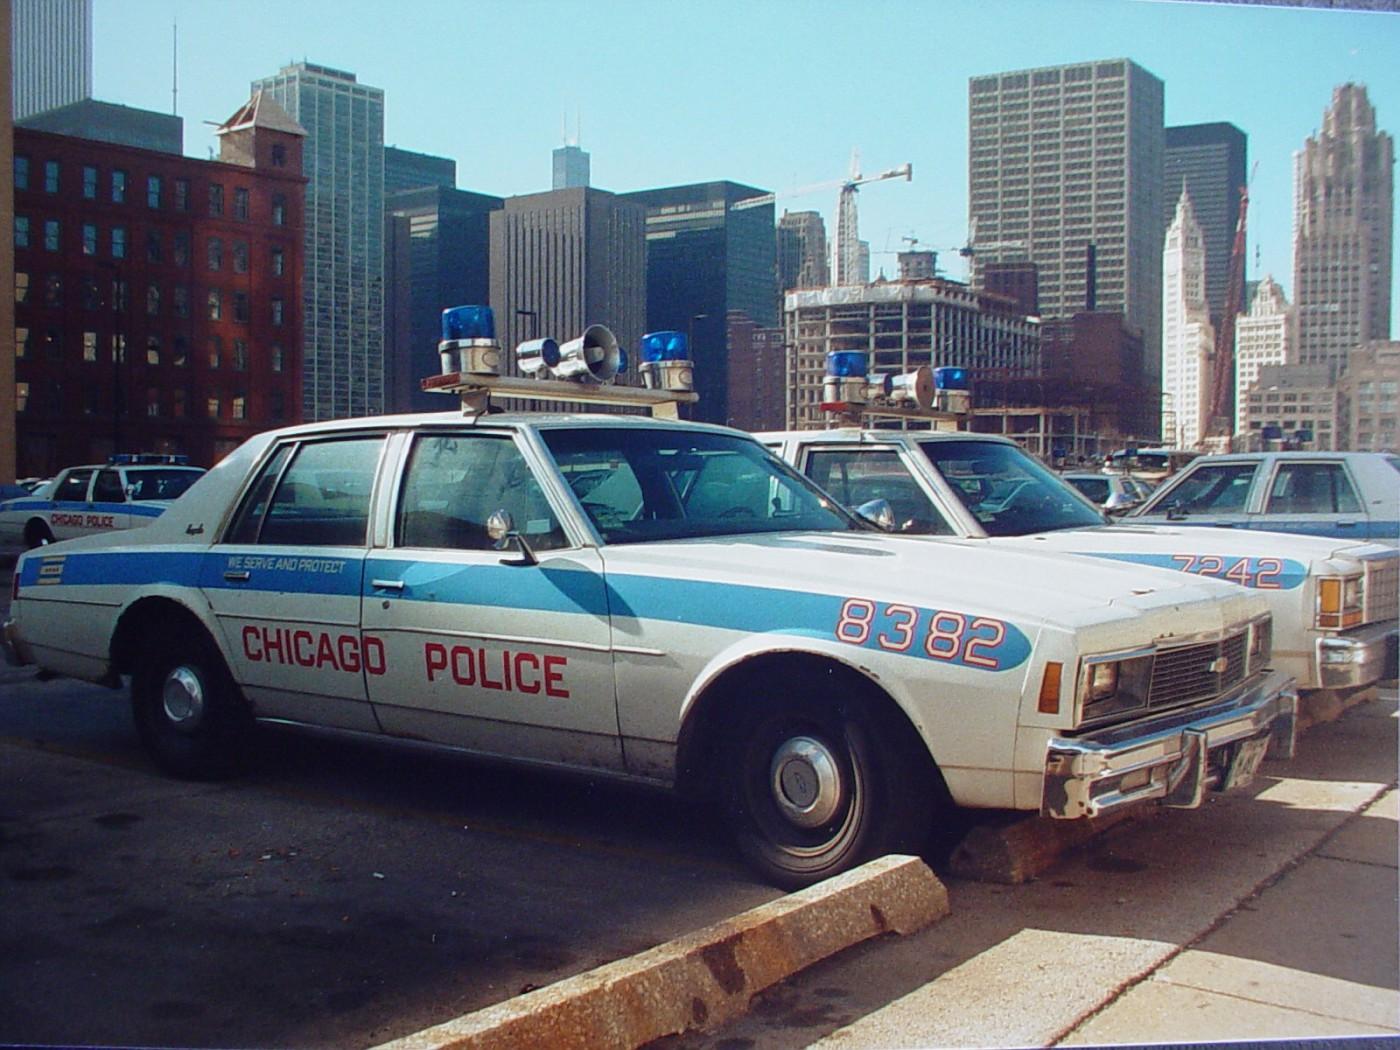 Photo 1979 Chevy Impala Chicago Police Vehicles 1975